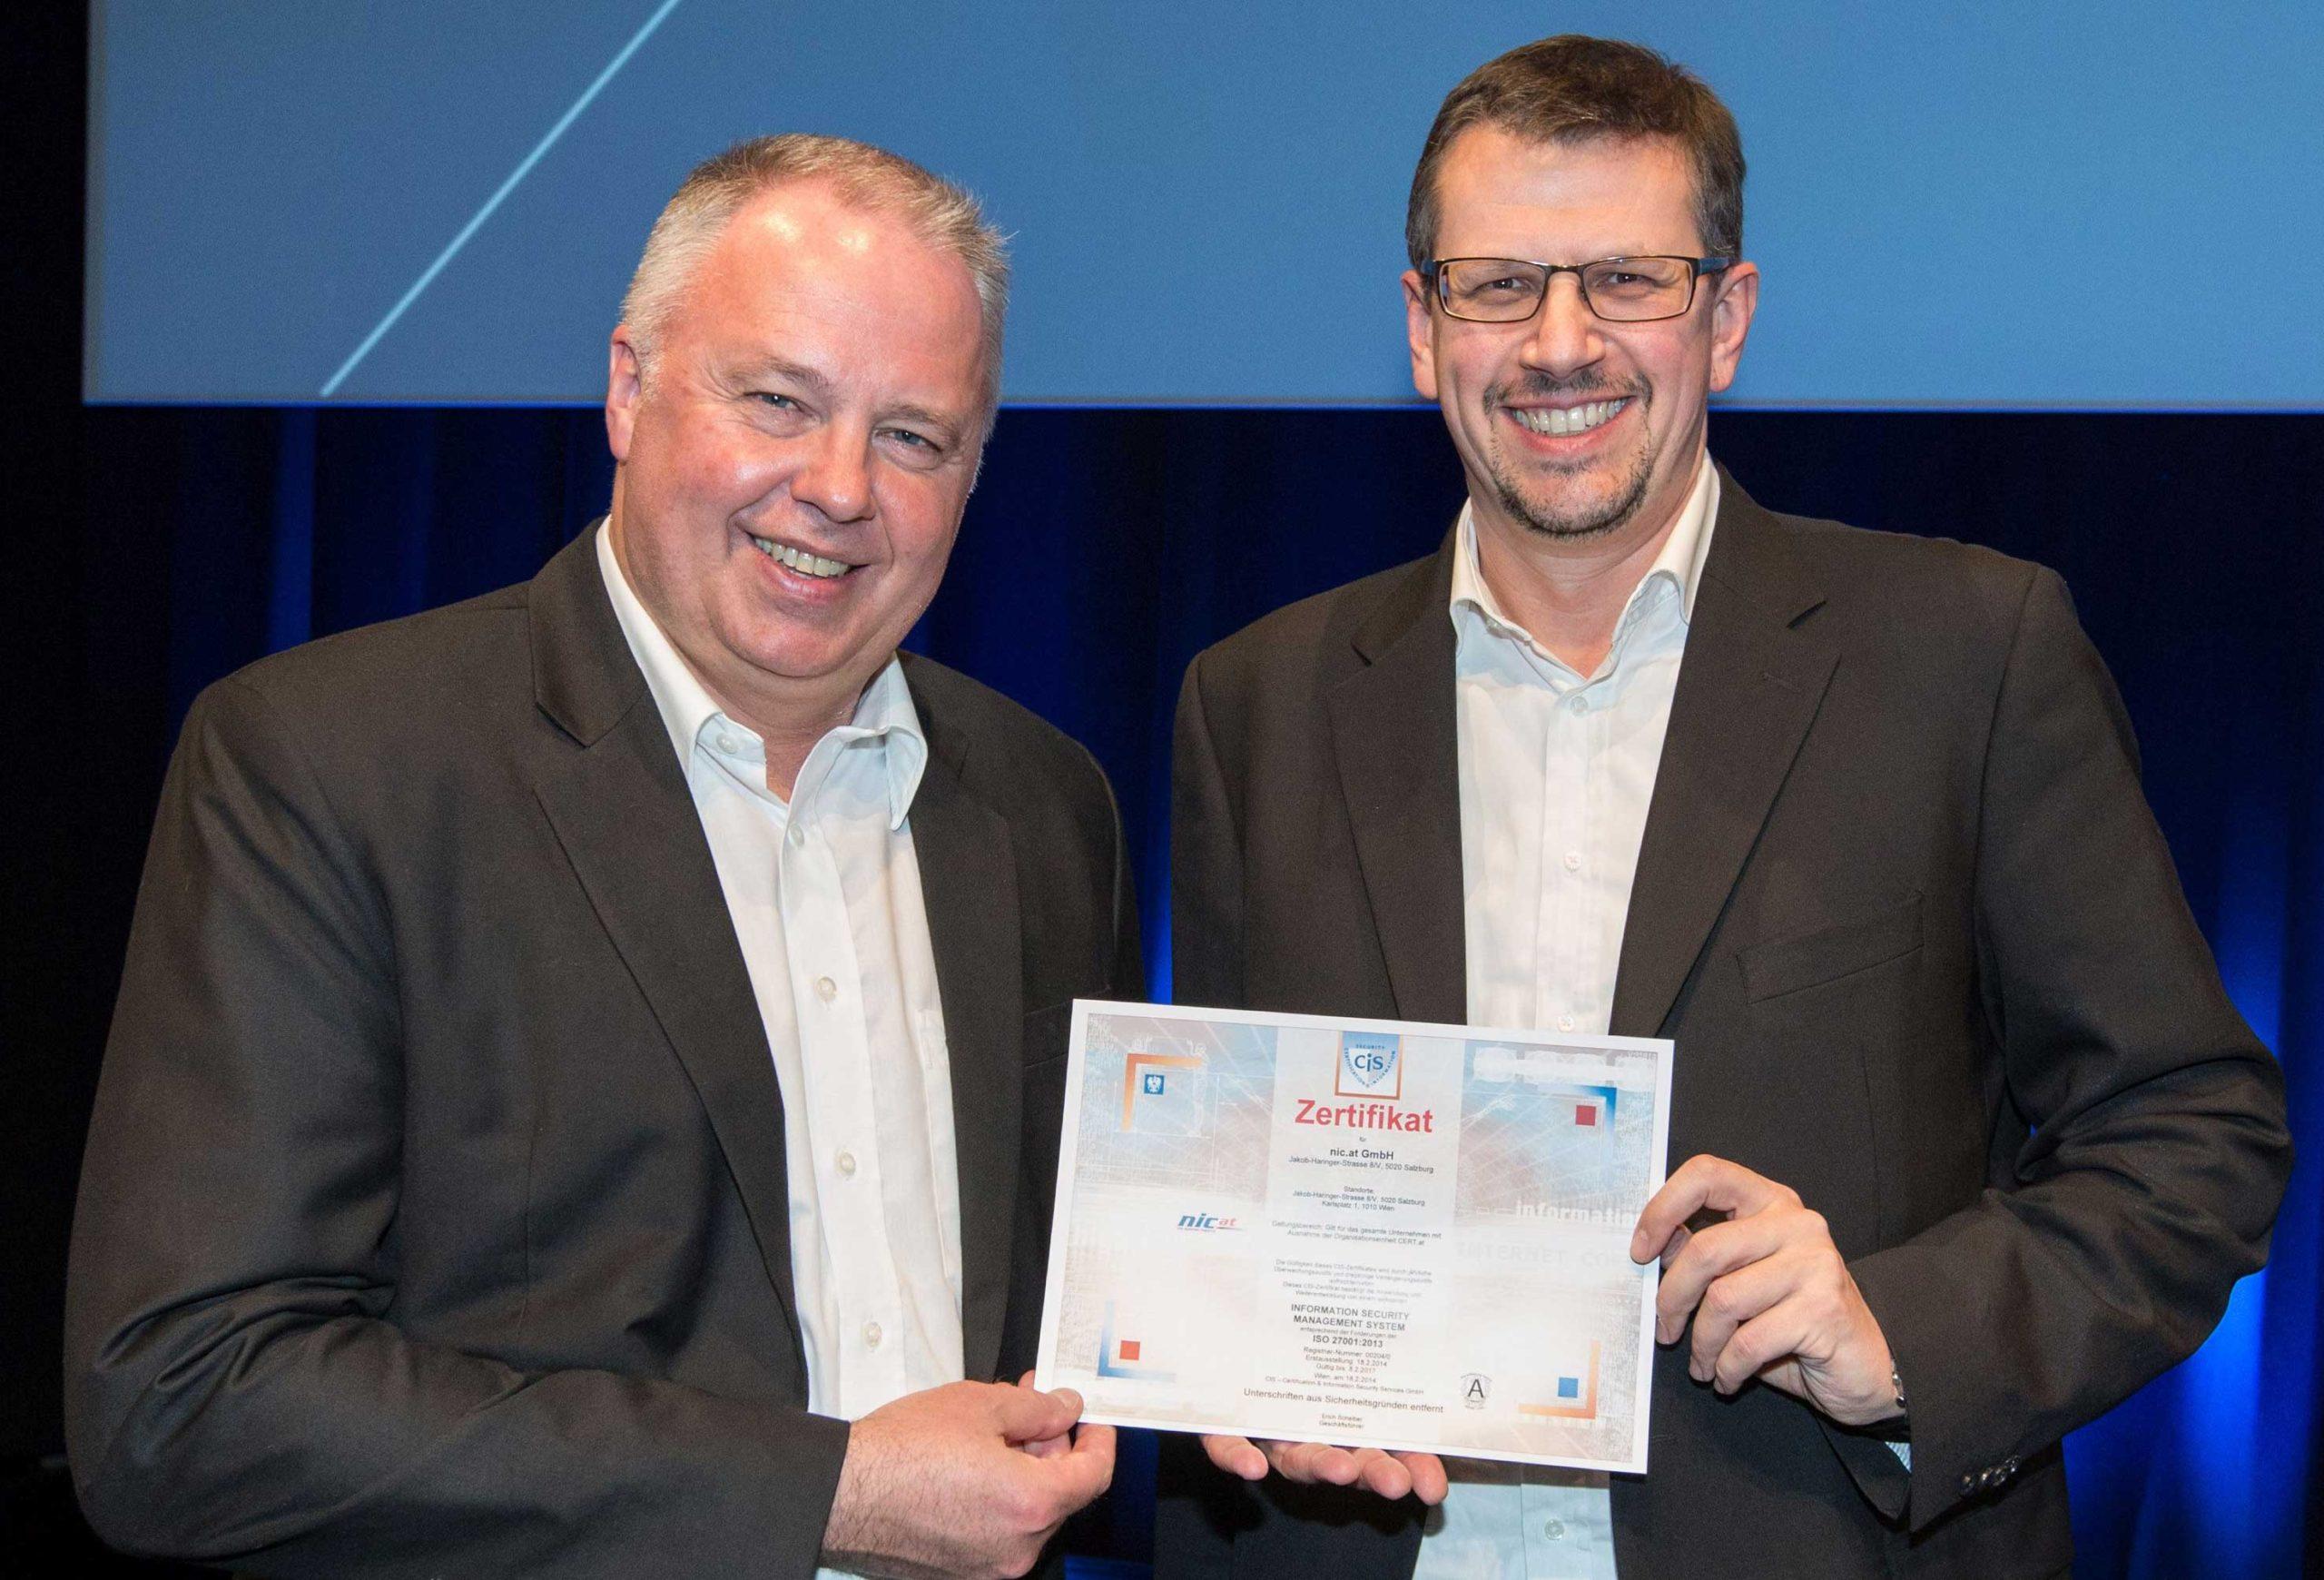 NicAT ISO Certificate DomainPulse 2014